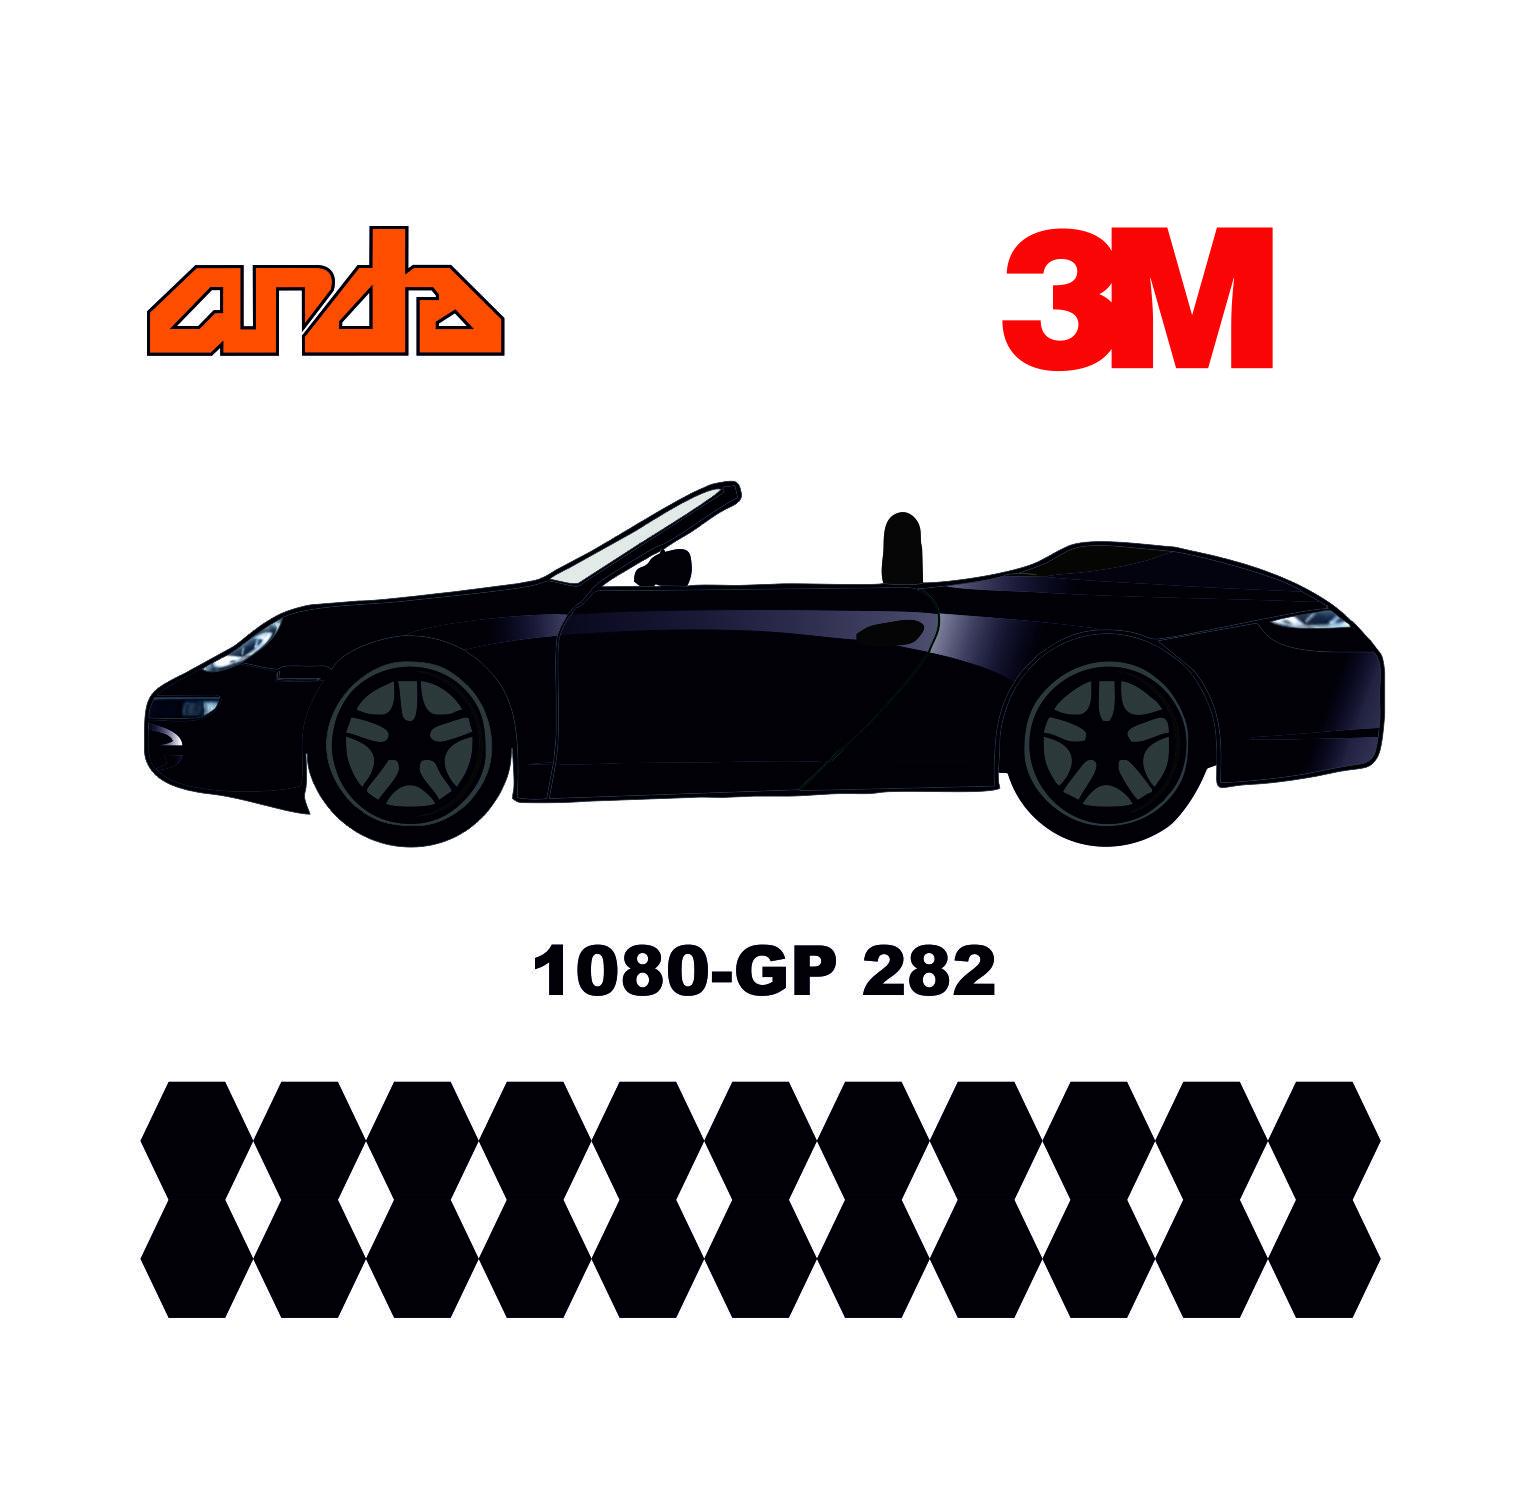 3M 1080-GP282 Parlak Kor Ateş Siyahı 1